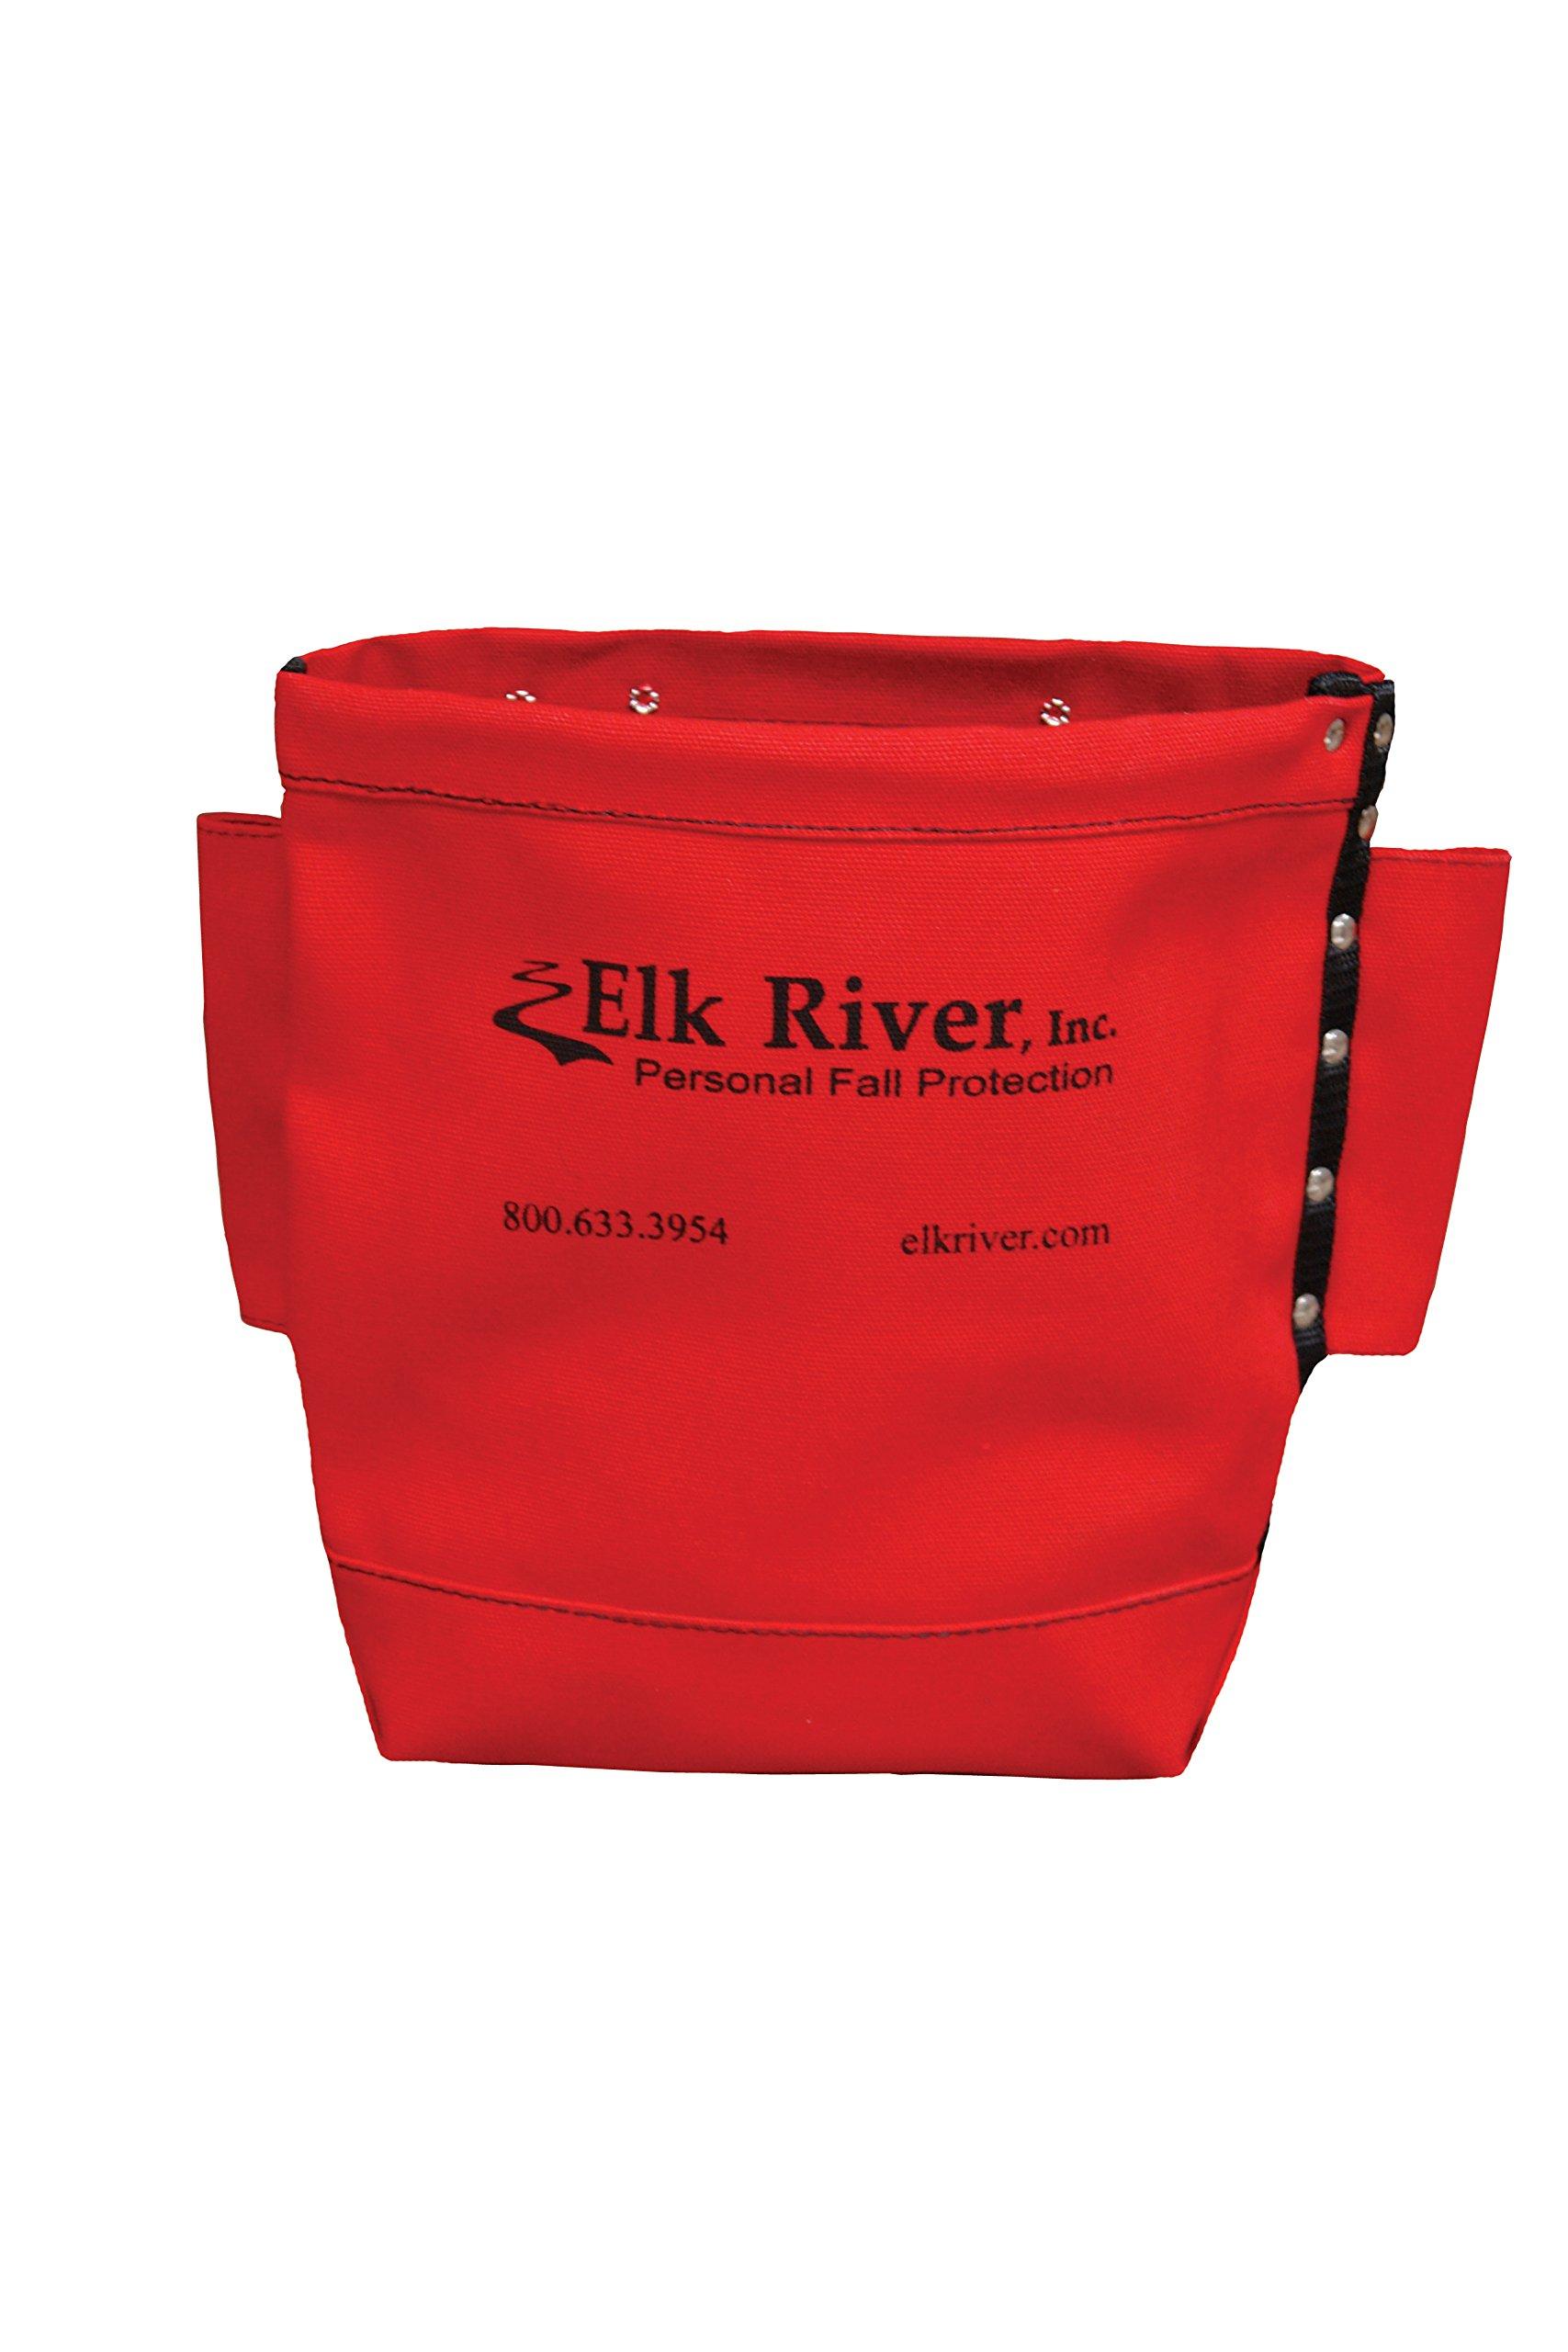 Elk River Canvas Bolt Bag with Drawstring top